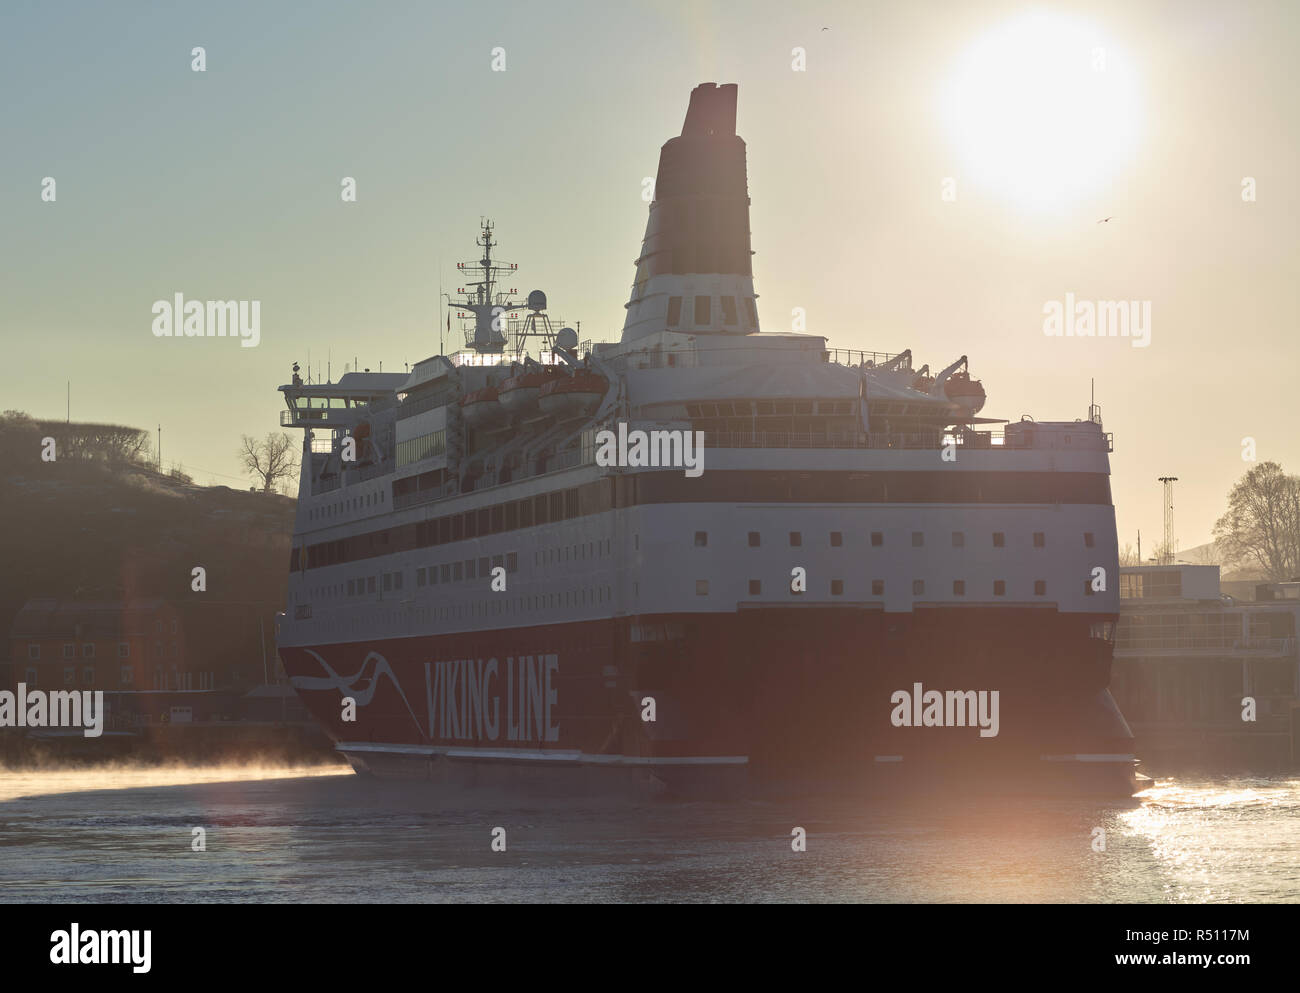 Viking Line ferry turning in foggy morning Stockholm harbor, Sweden - Stock Image